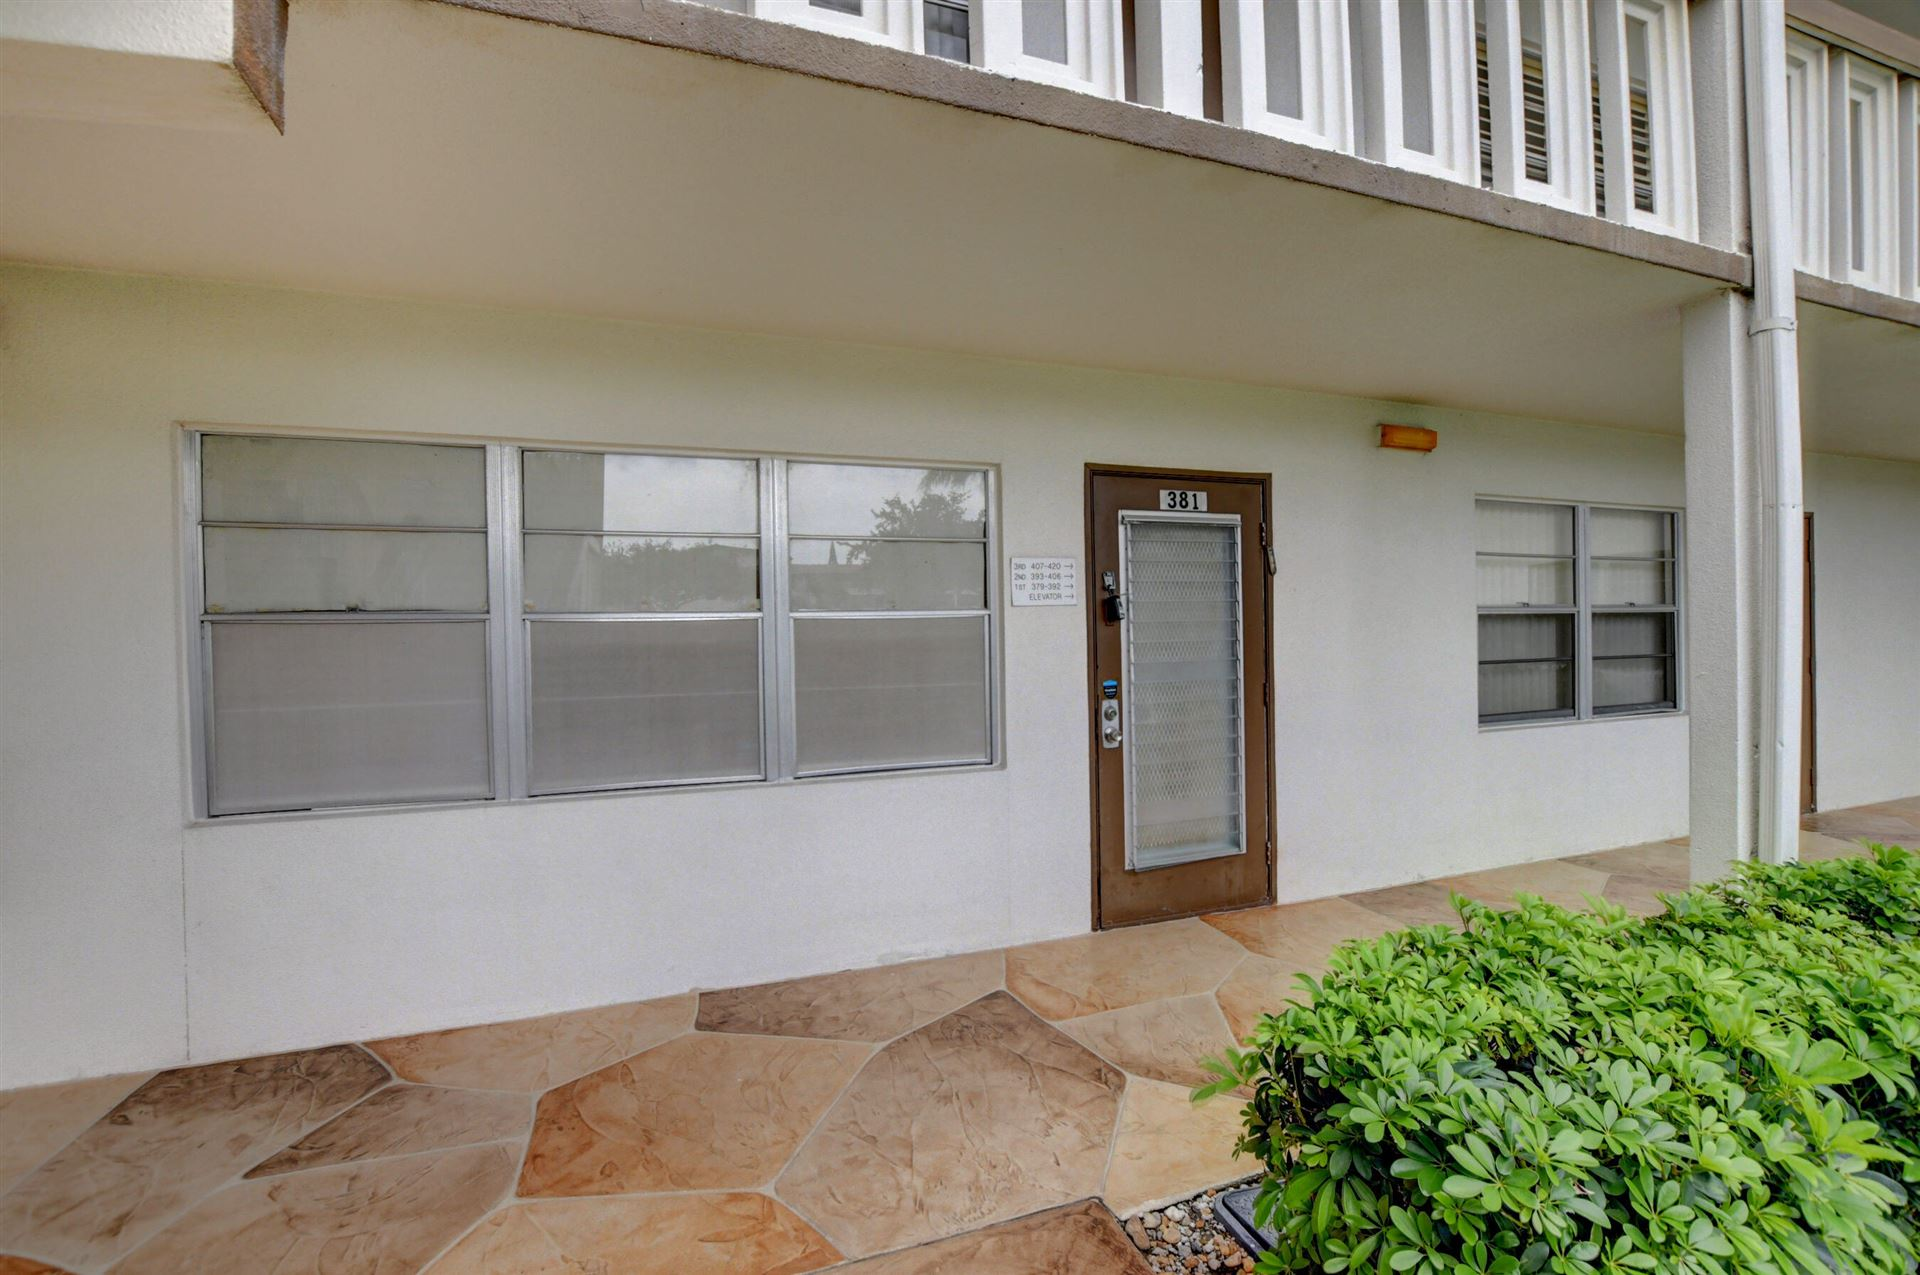 381 Mansfield J, Boca Raton, FL 33434 - #: RX-10727510